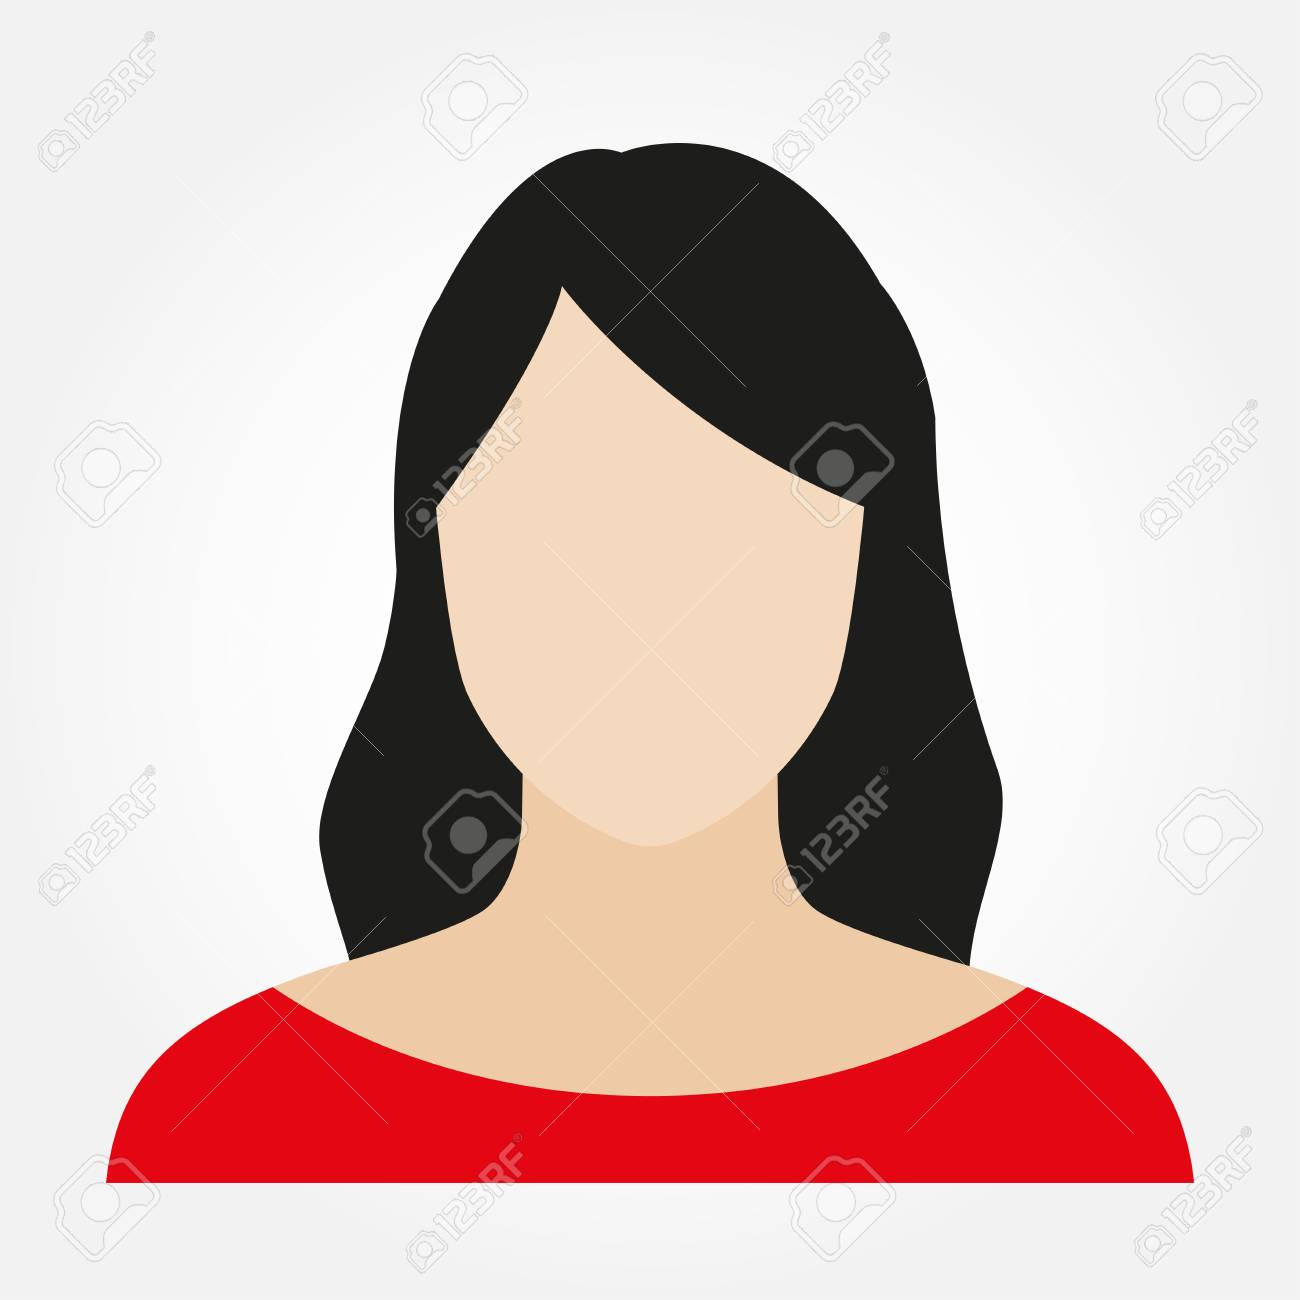 Woman avatar profile. Female face icon. Vector illustration. - 109815471